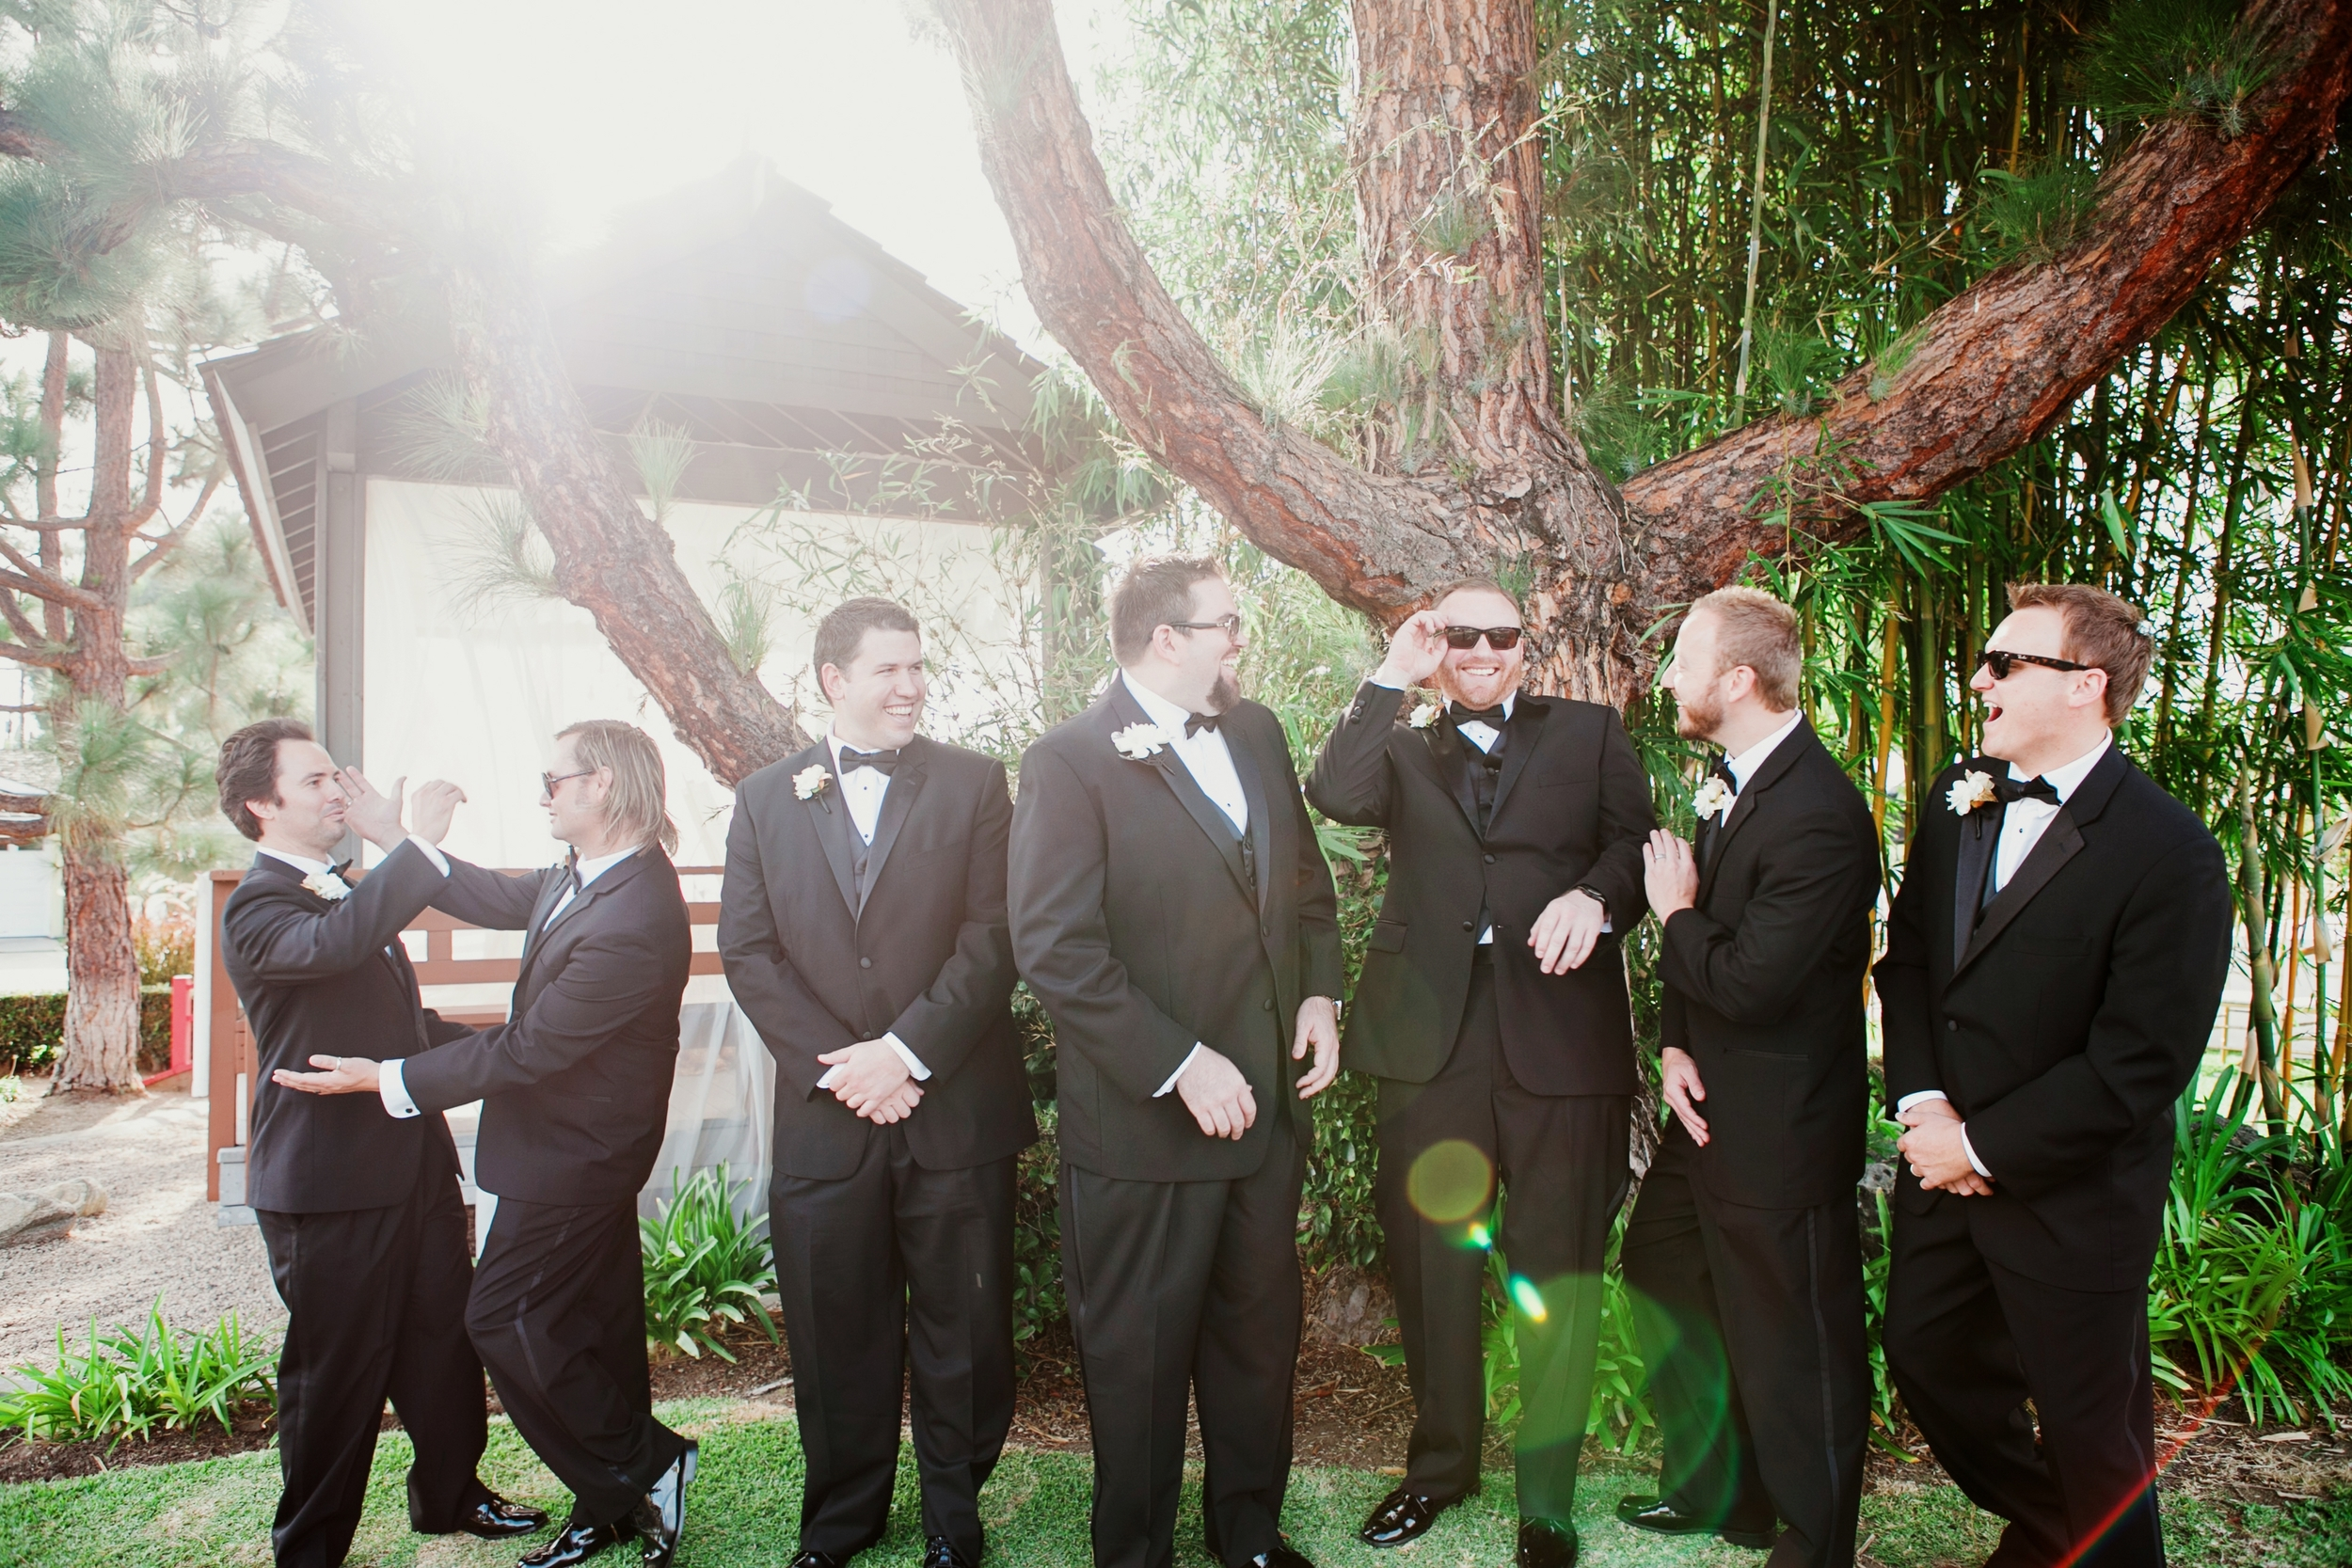 The-Suitcase-Studio-Timree-Matt-Lifestyle-Wedding-Photographer-013.jpg